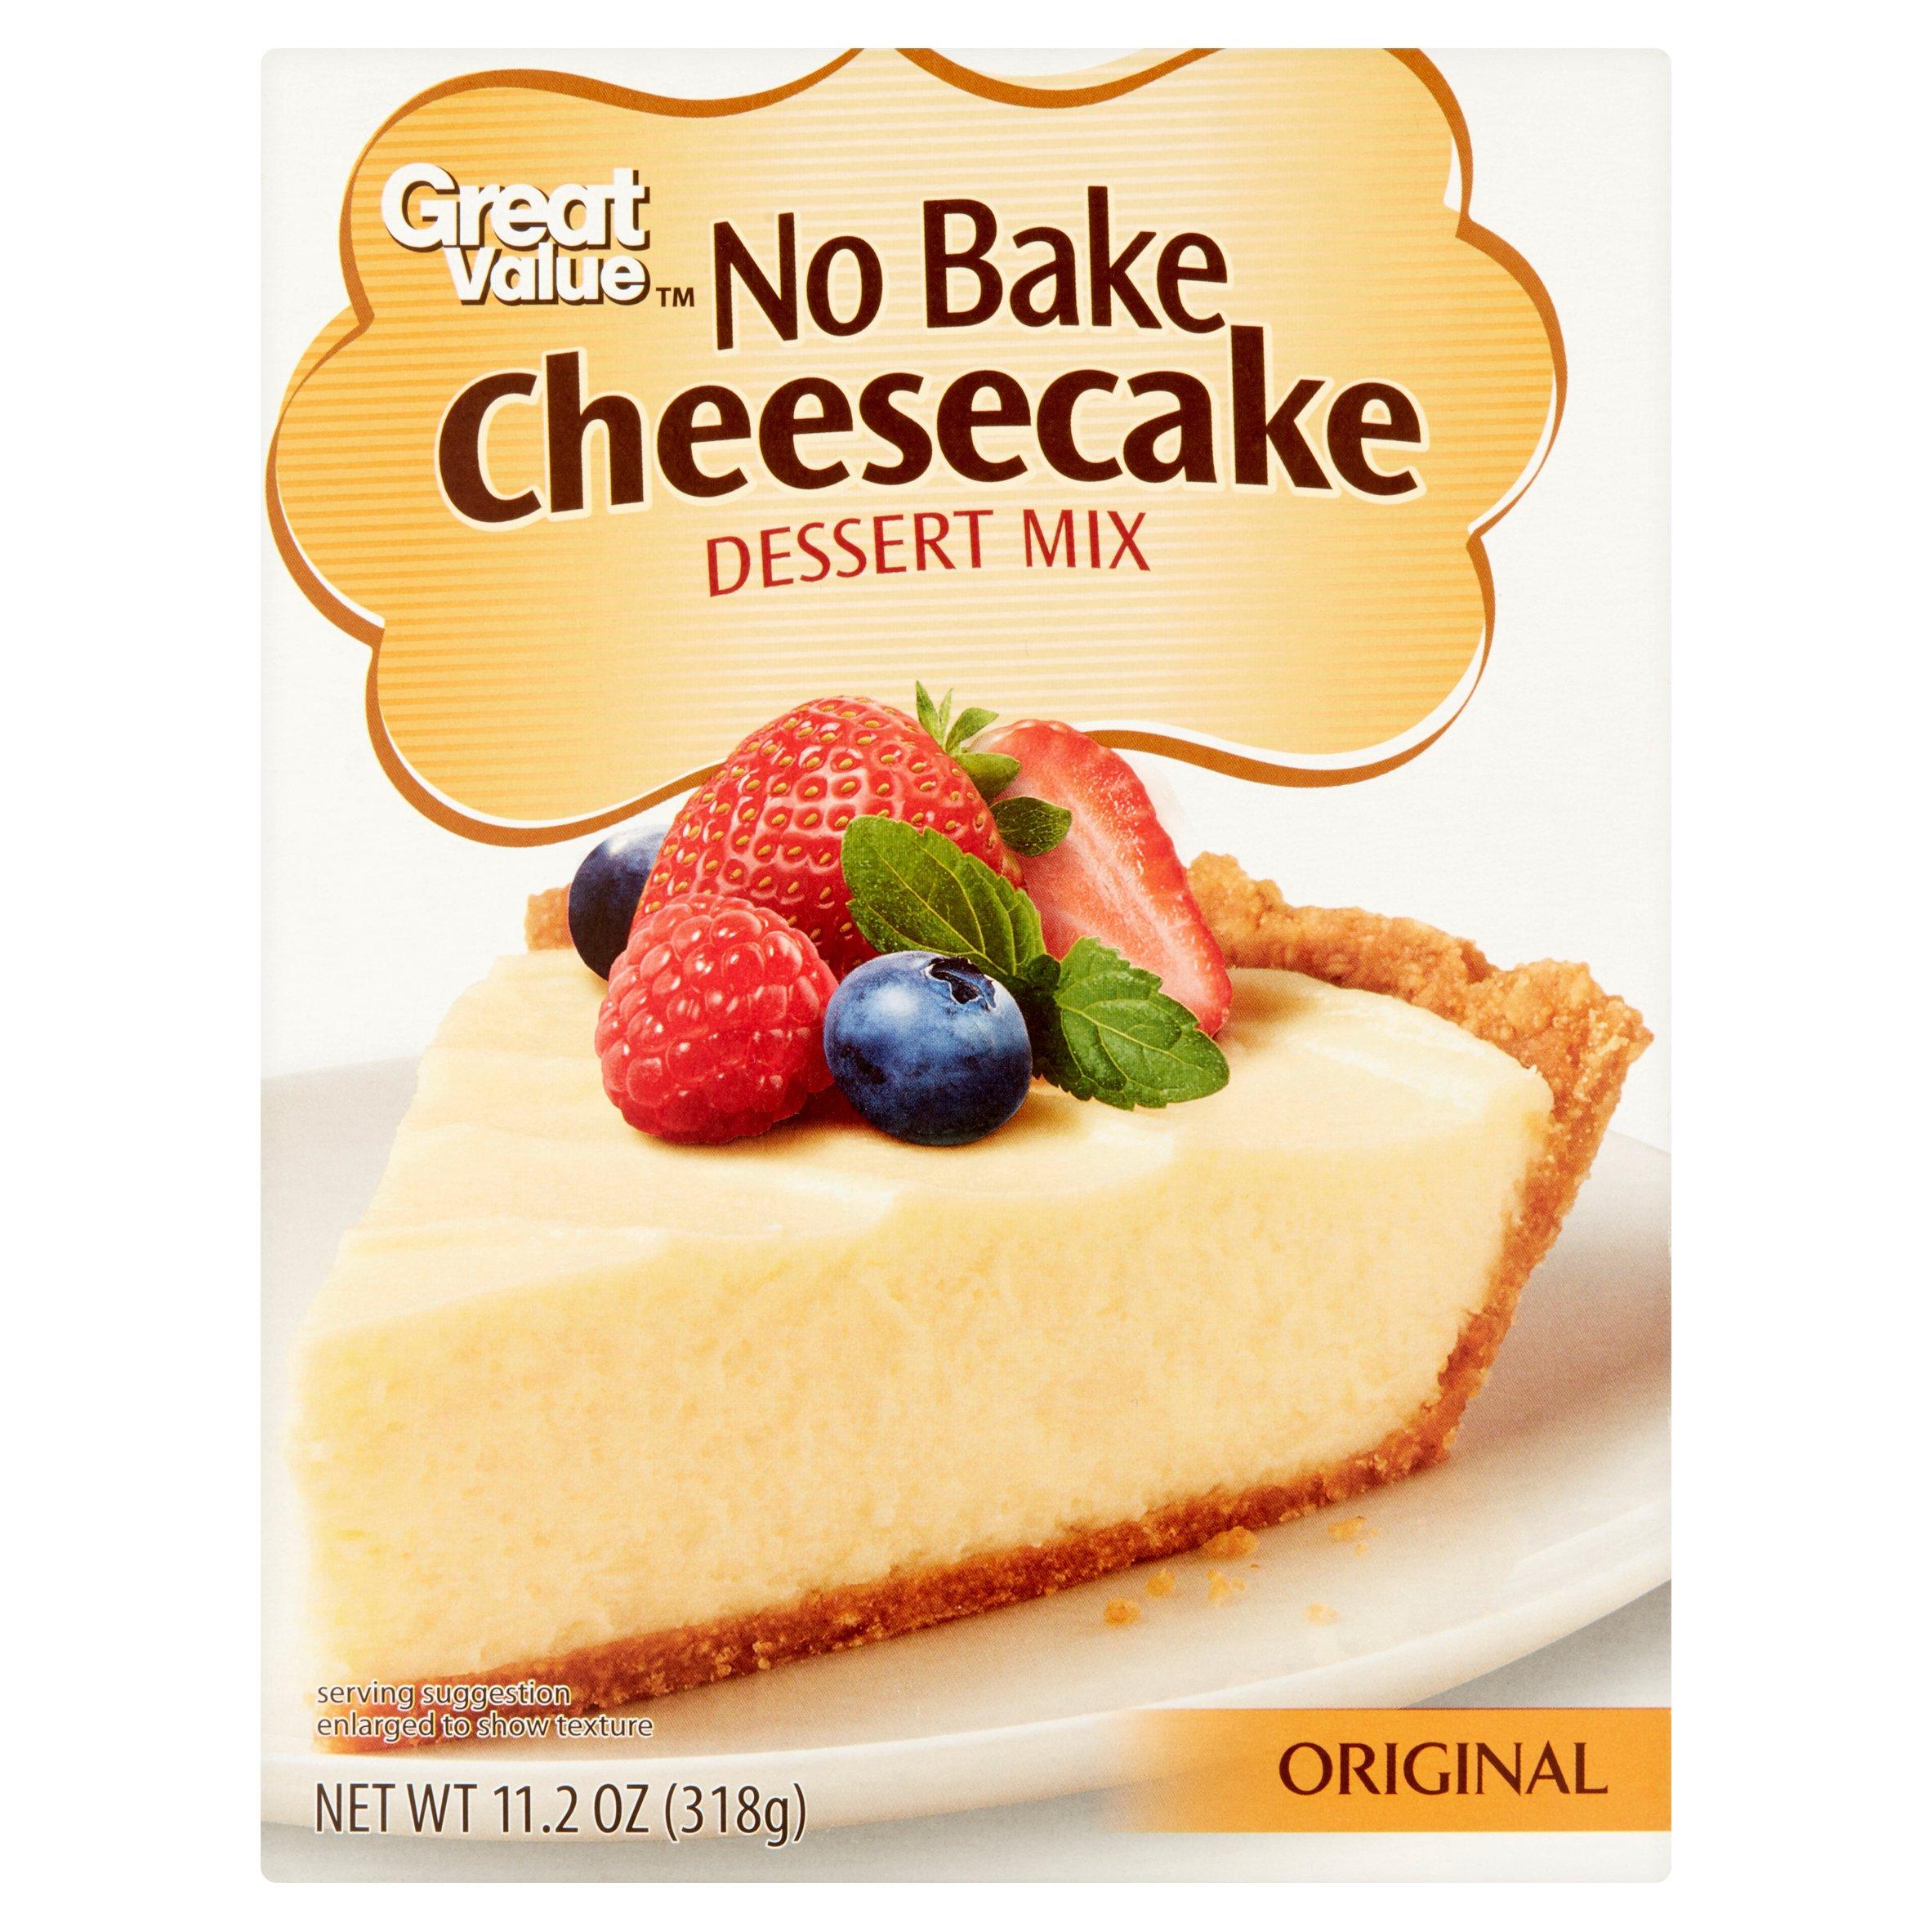 Great Value Dessert Mix No Bake Cheesecake Original 11 2 Oz